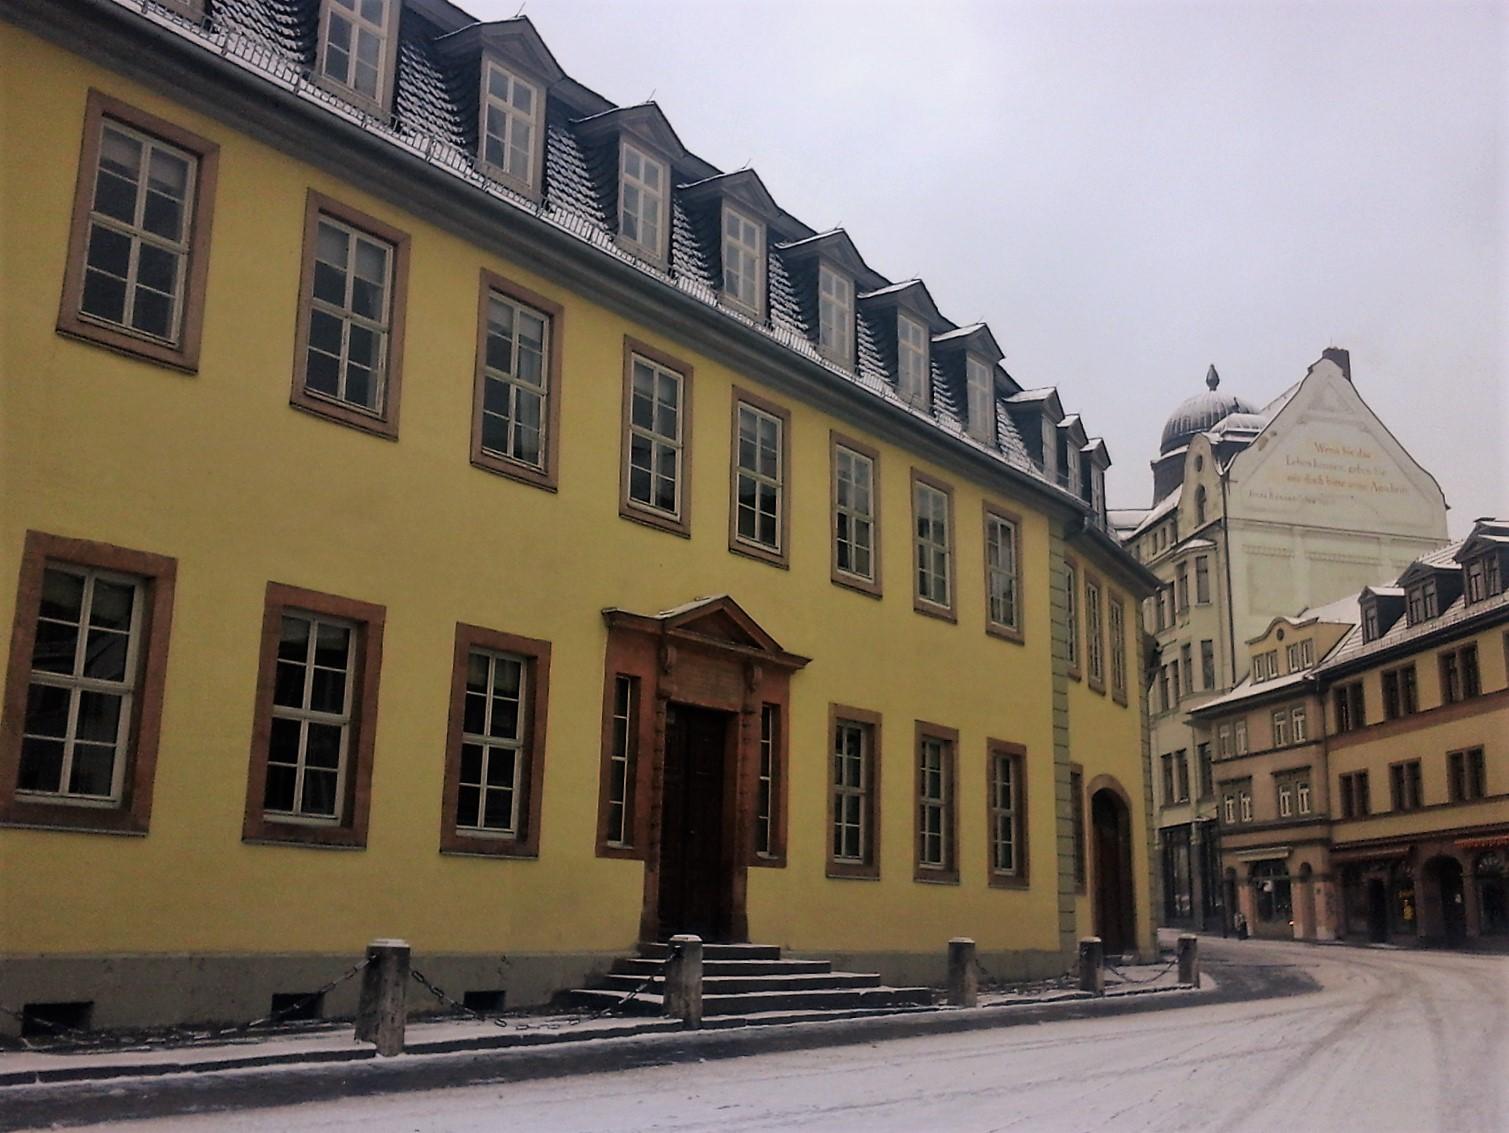 Germania visitare la casa di goethe a weimar emotion recollected in tranquillity - Casa in germania ...